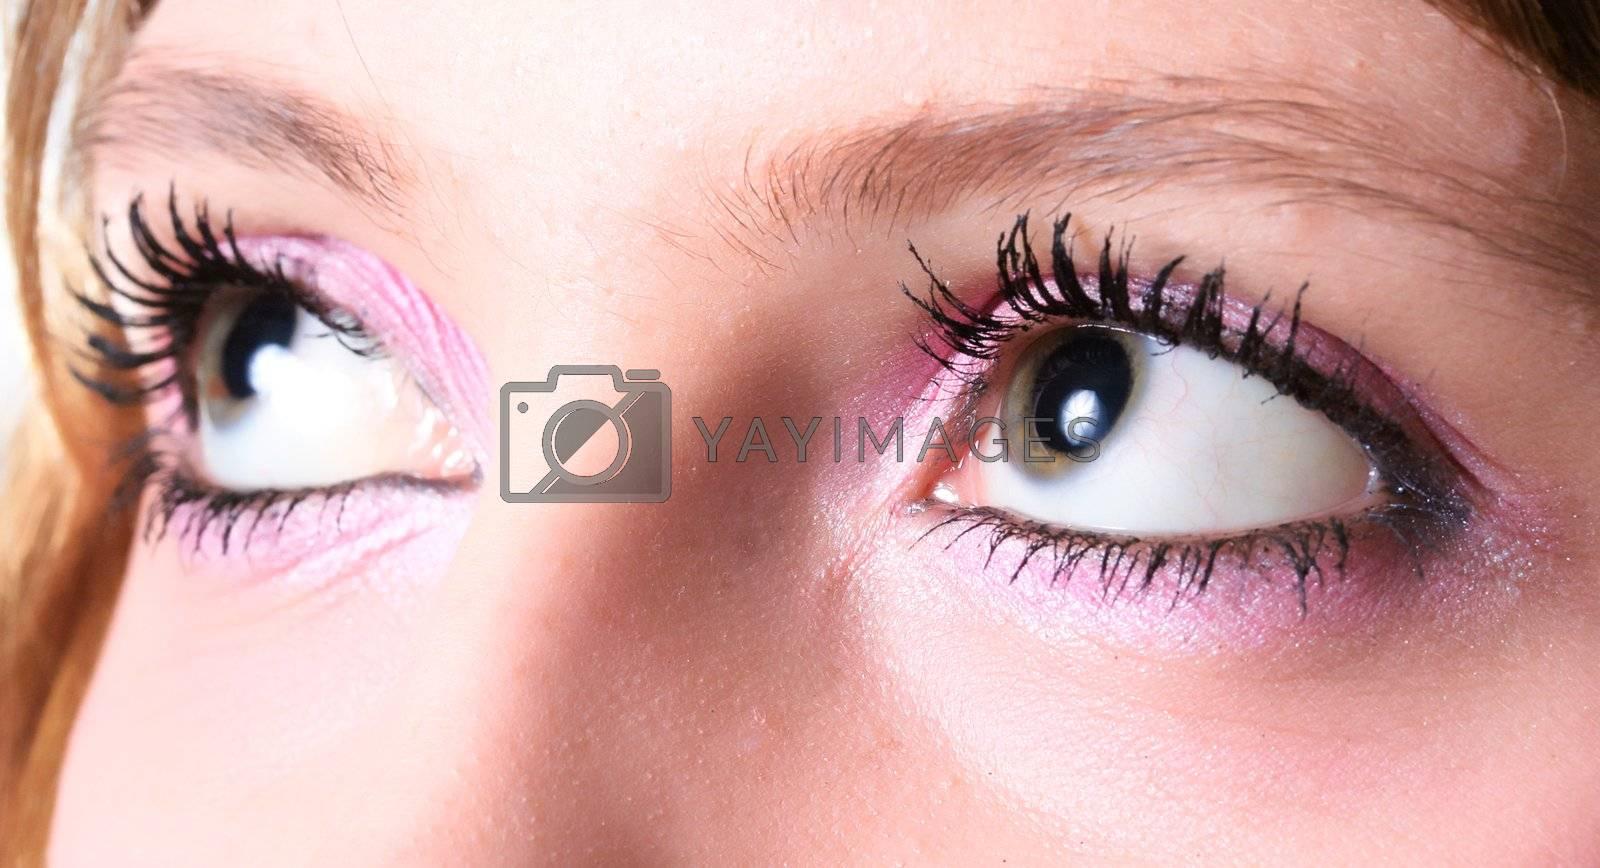 face skin eyesight make-up human eyelash mascara